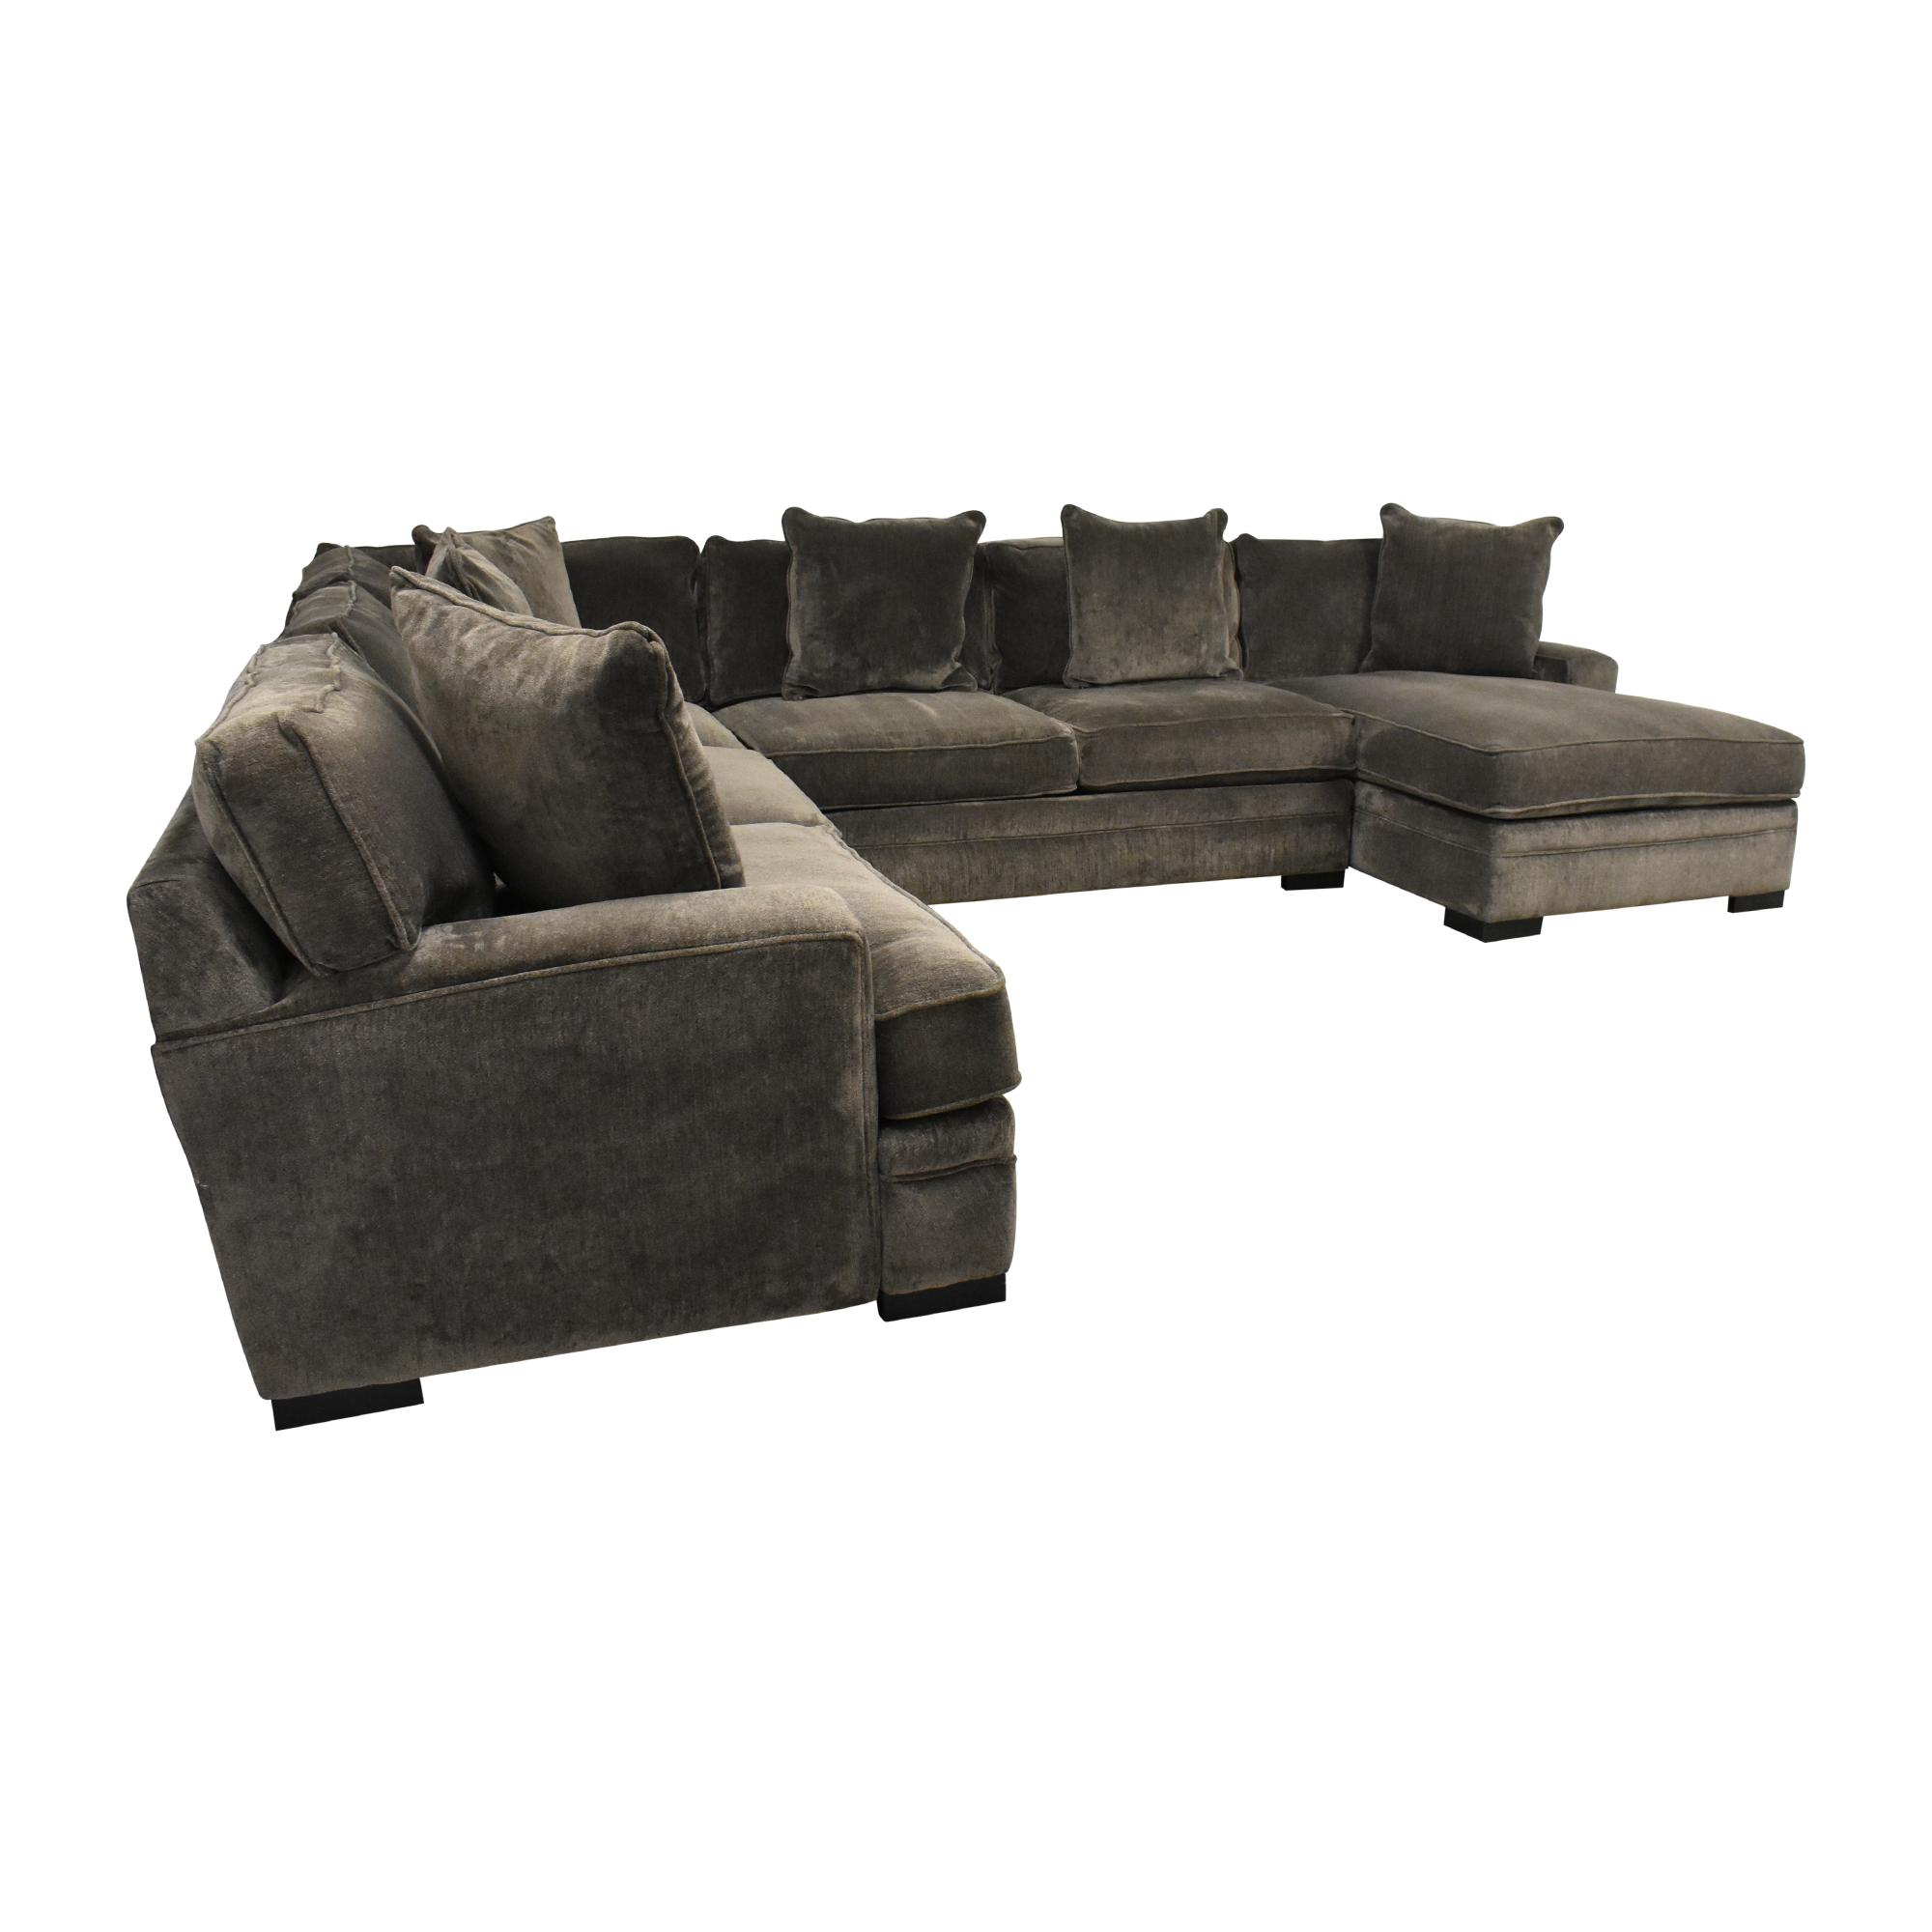 shop Macy's Macy's Corner Chaise Sectional Sofa online